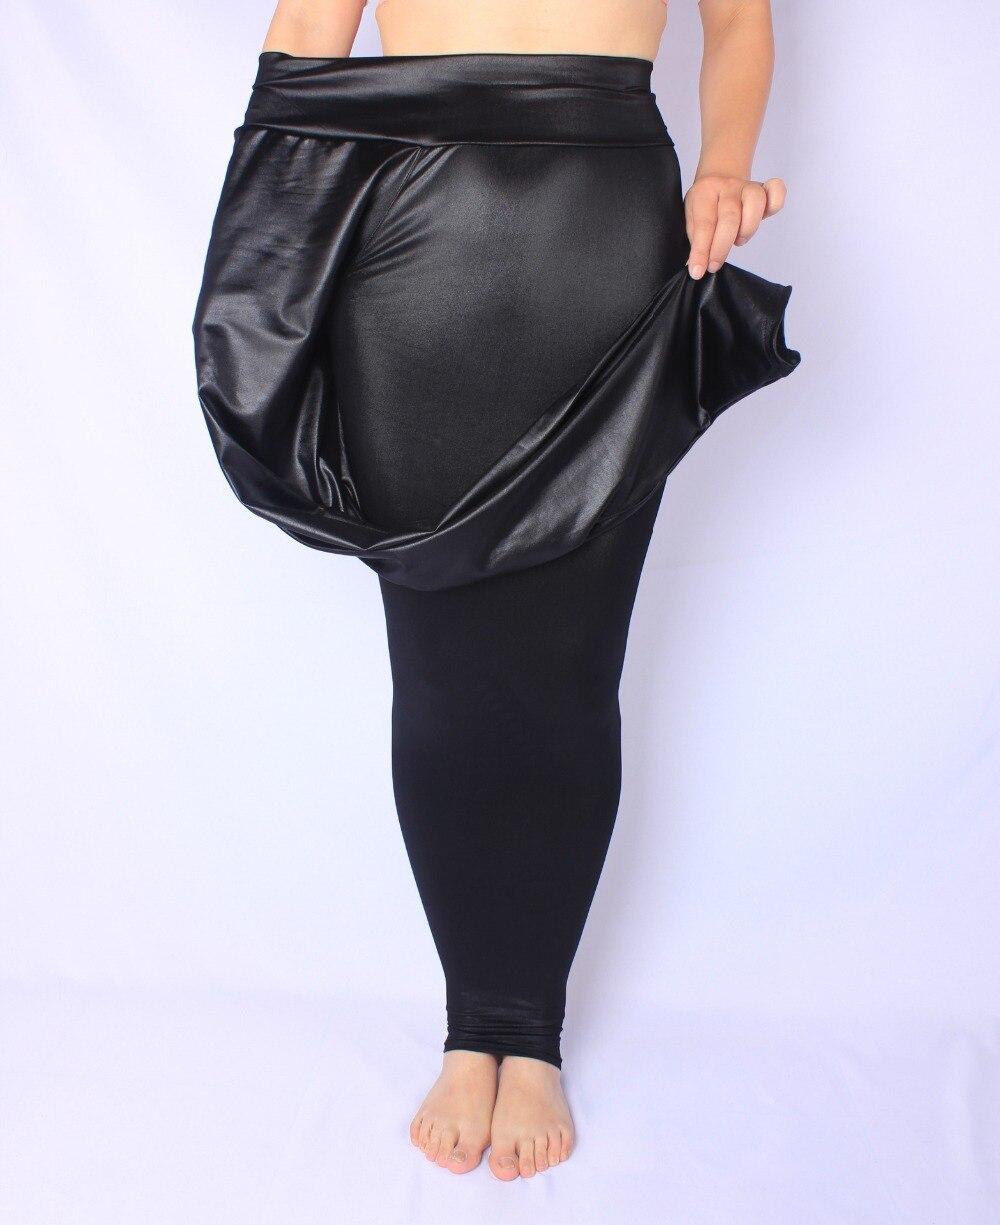 Women Autumn Leggings Plus Size 5XL 6xl 7xl Big Sizes Large Slim Legging Pants Black Warm All-match